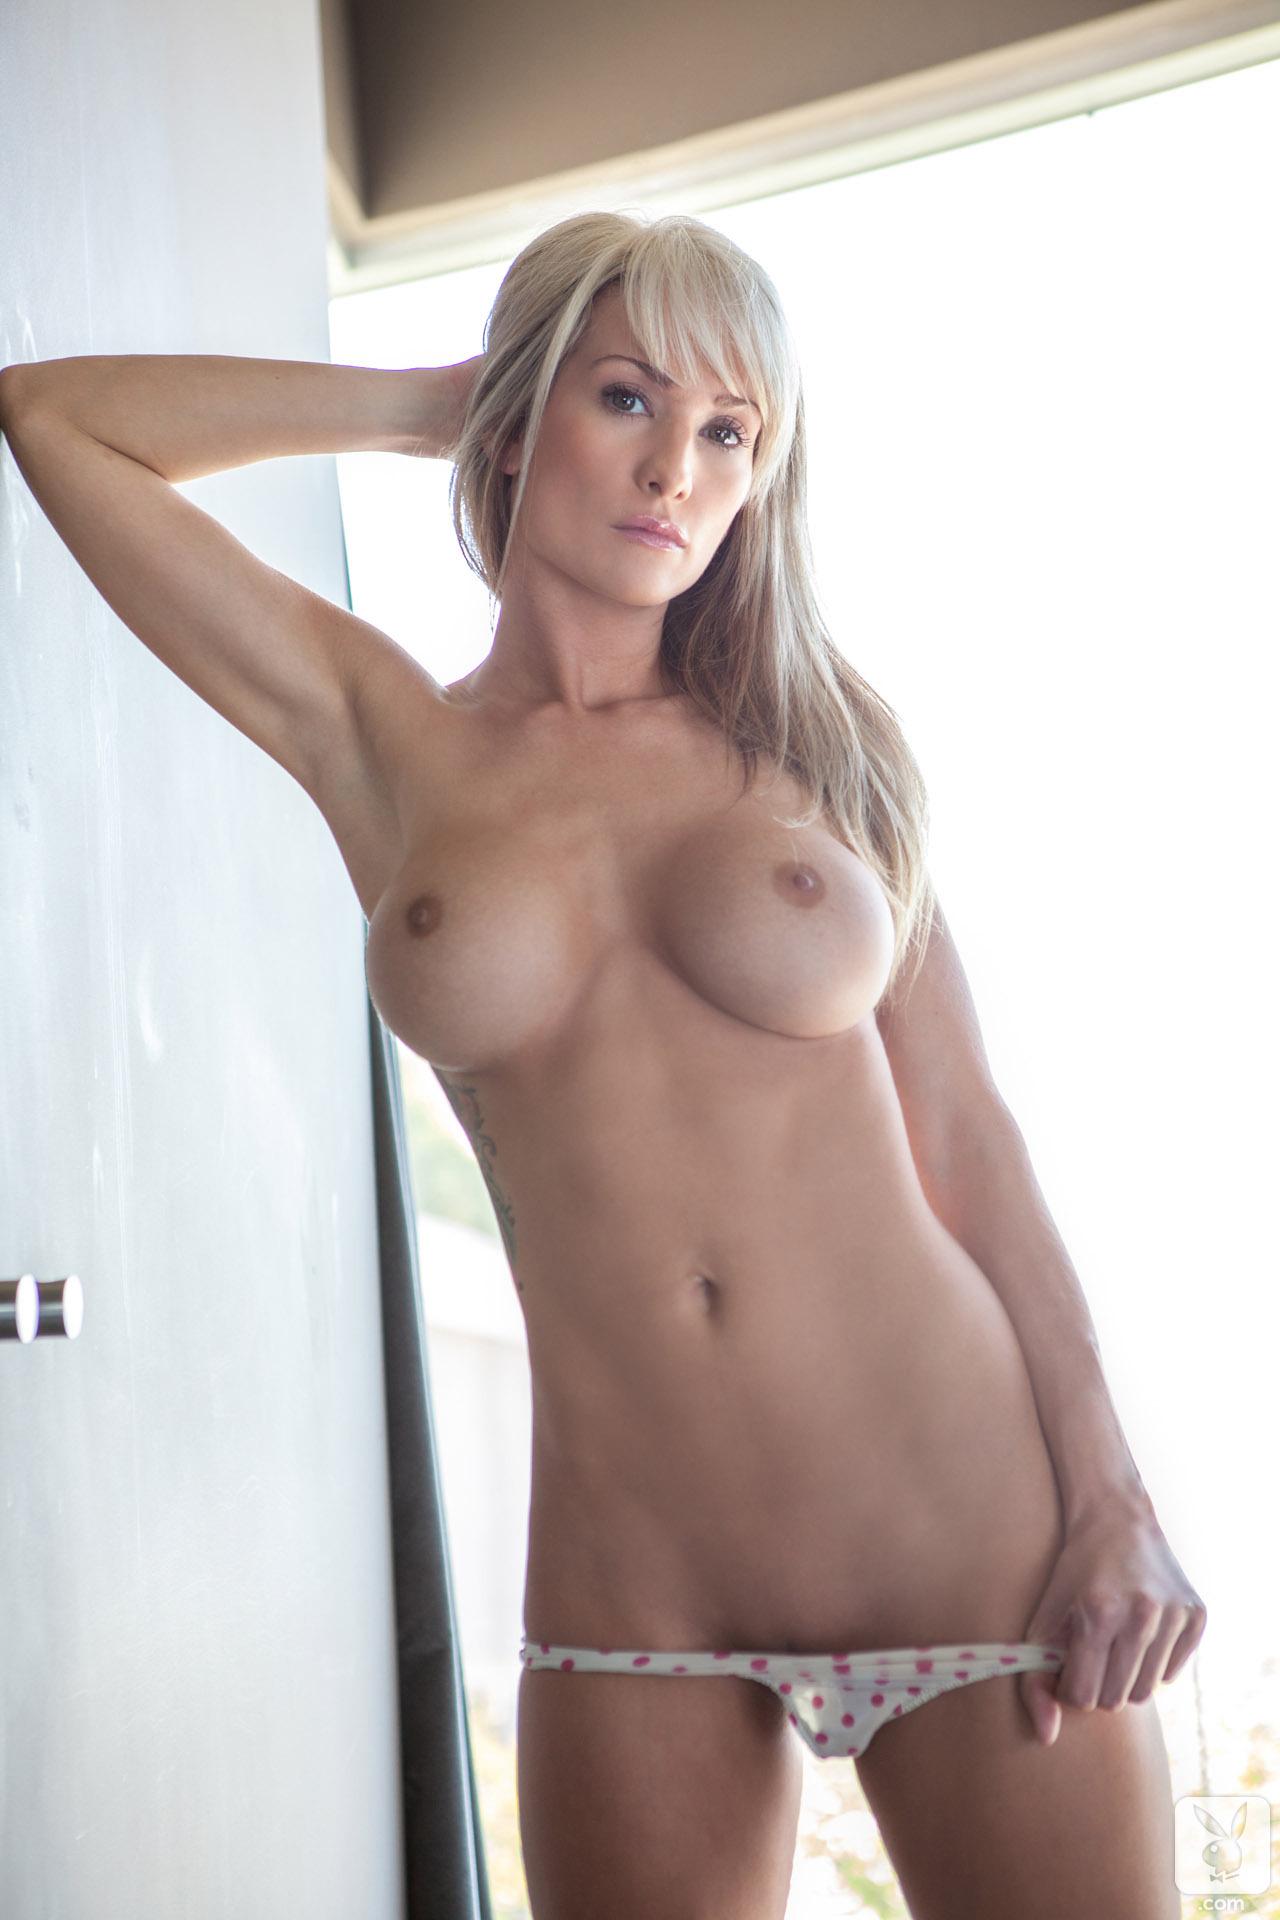 jessie-ann-blonde-boobs-bathtube-naked-playboy-05